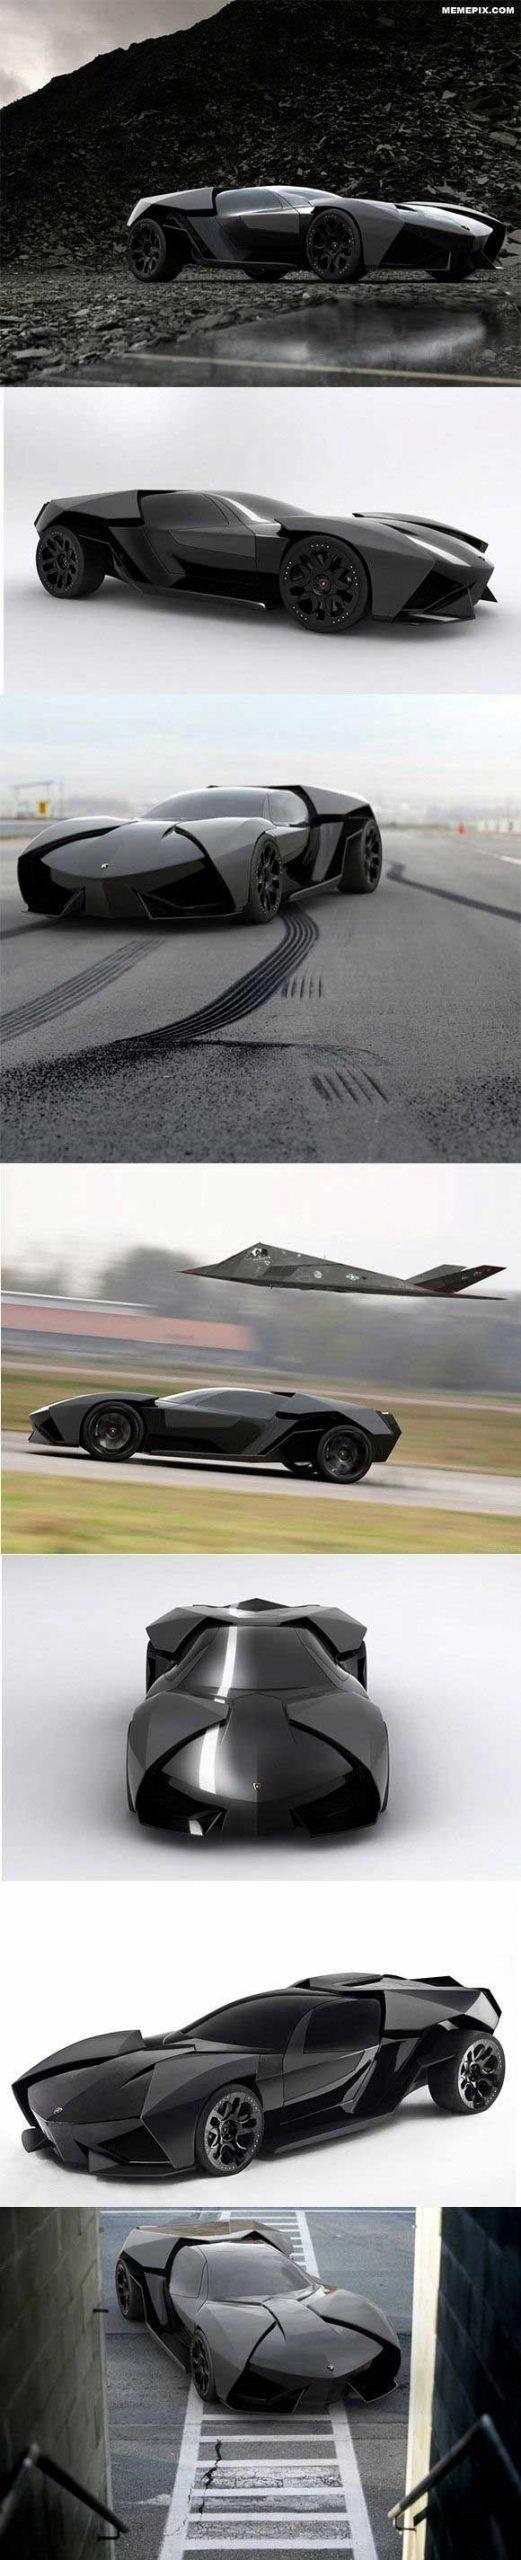 Lamborghini Ankonian Concept.